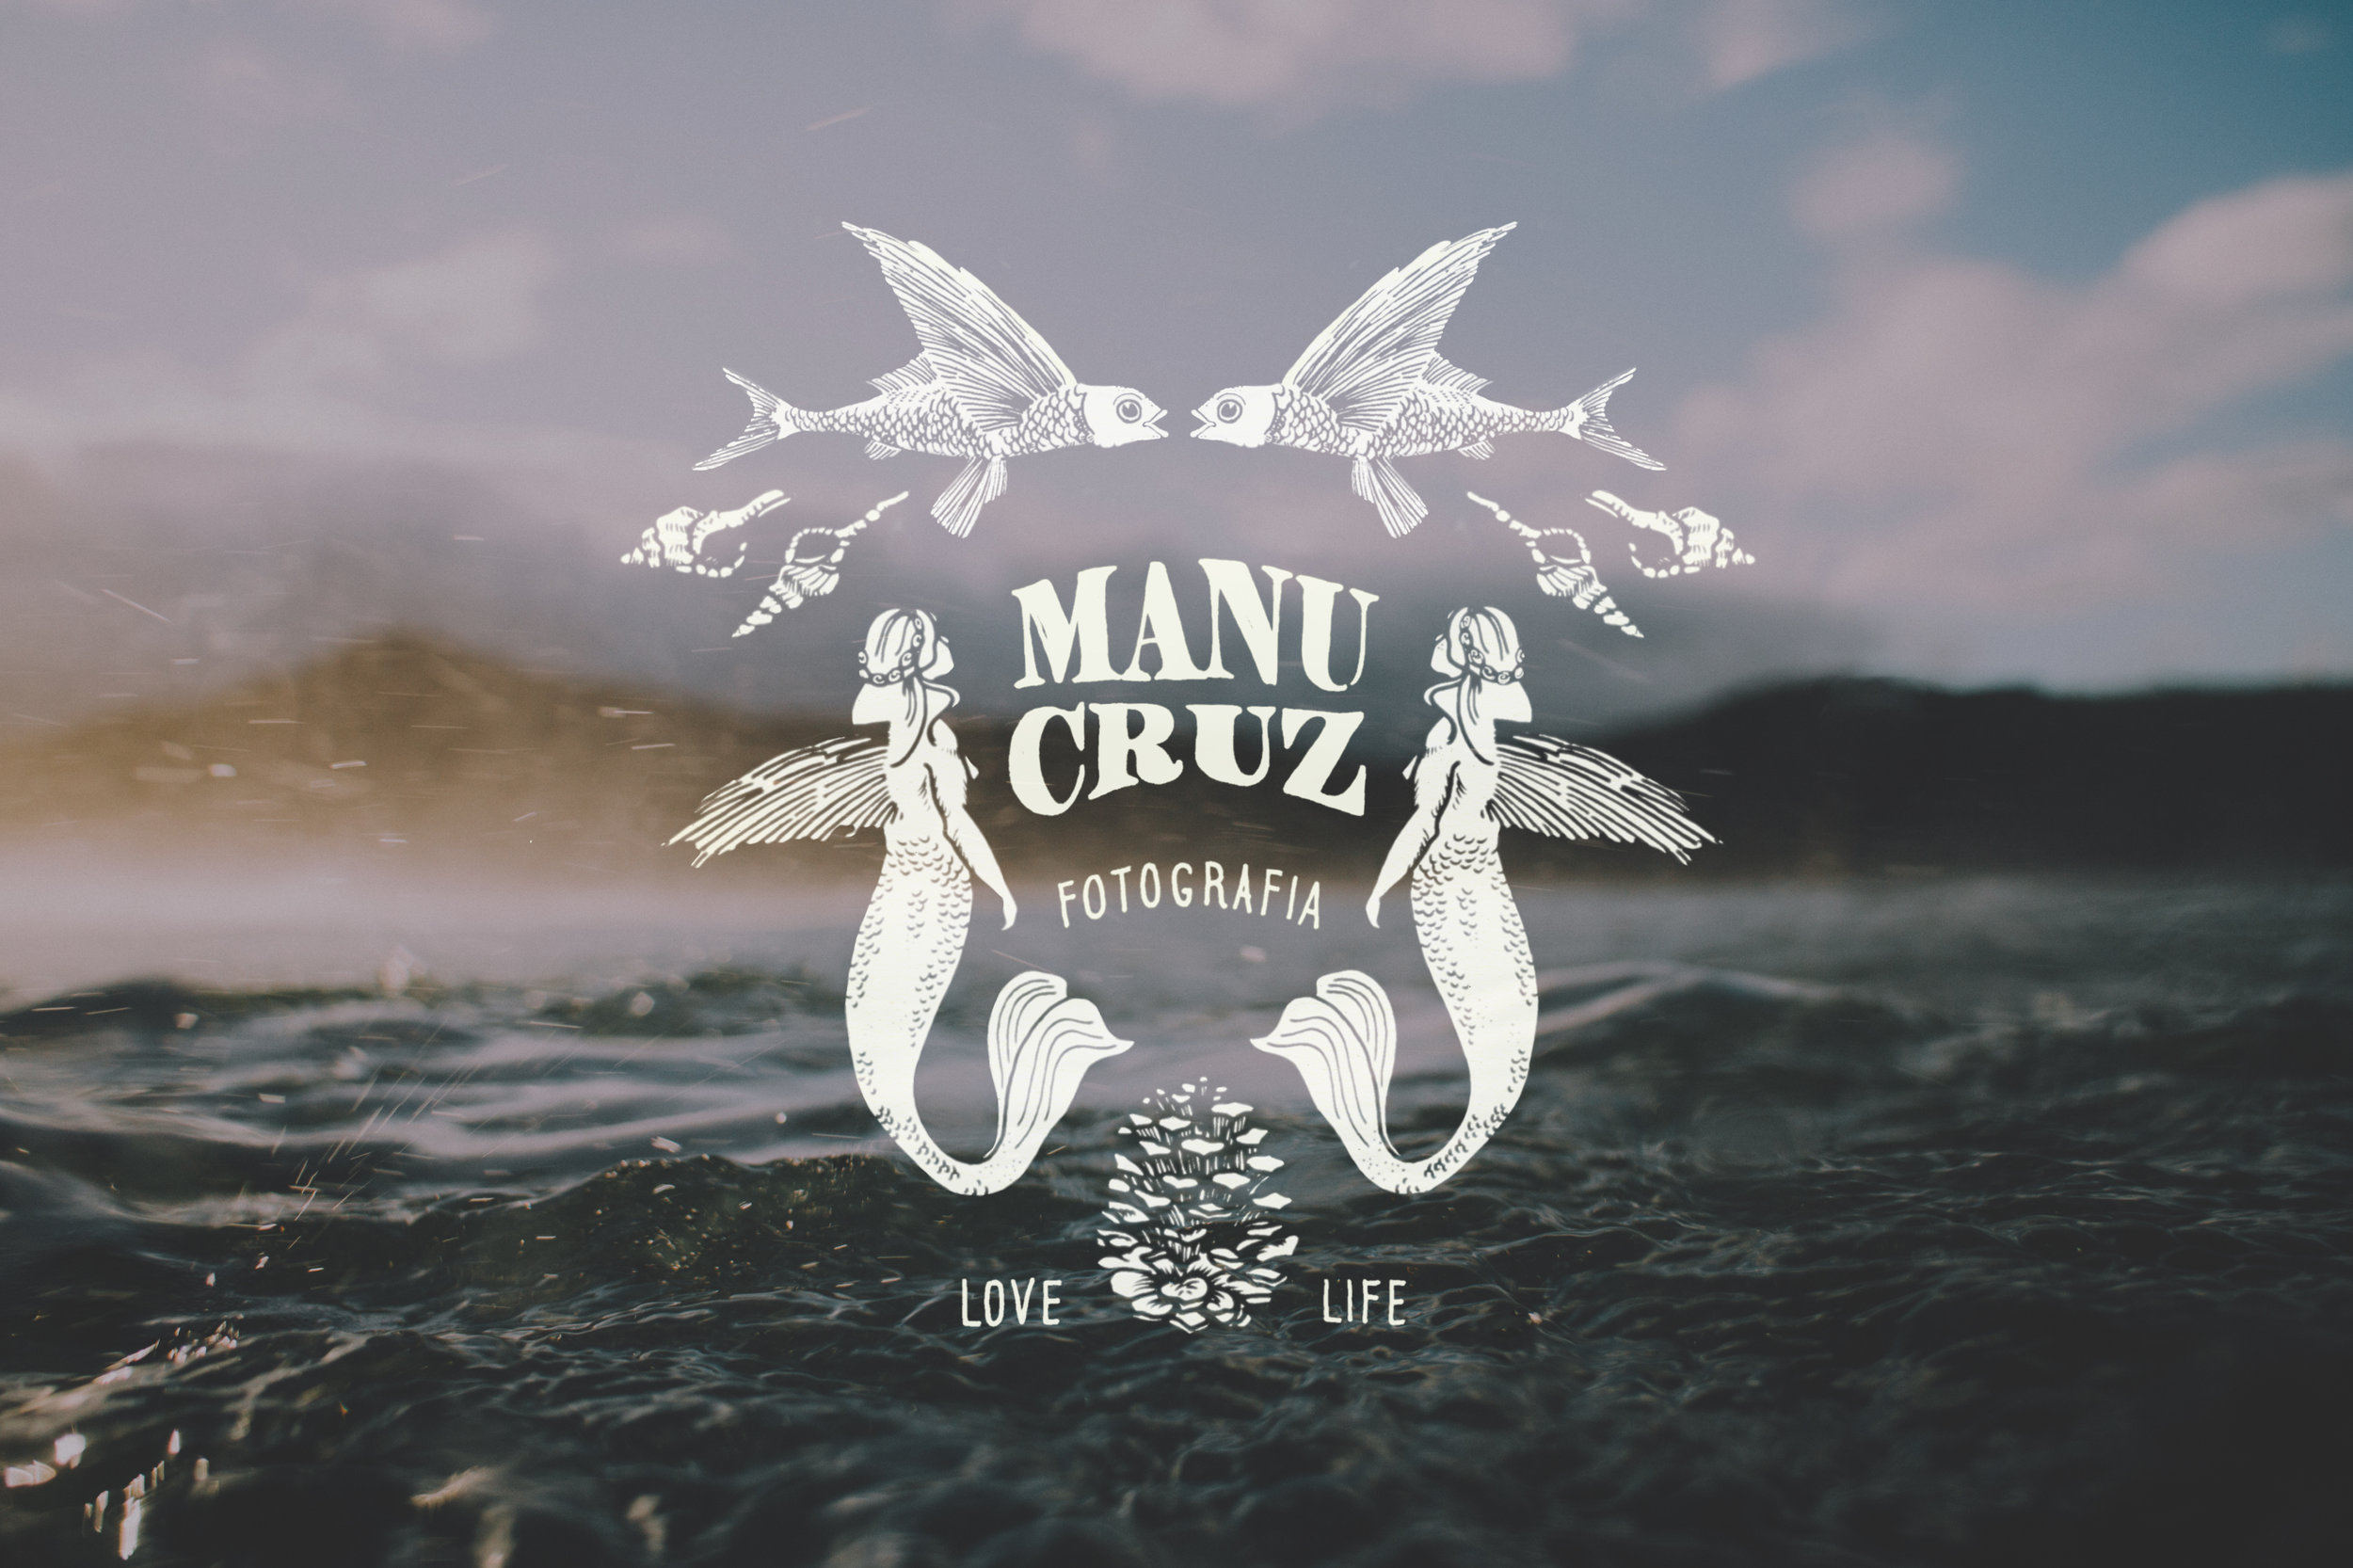 Manu Cruz branding by Castelo Studio